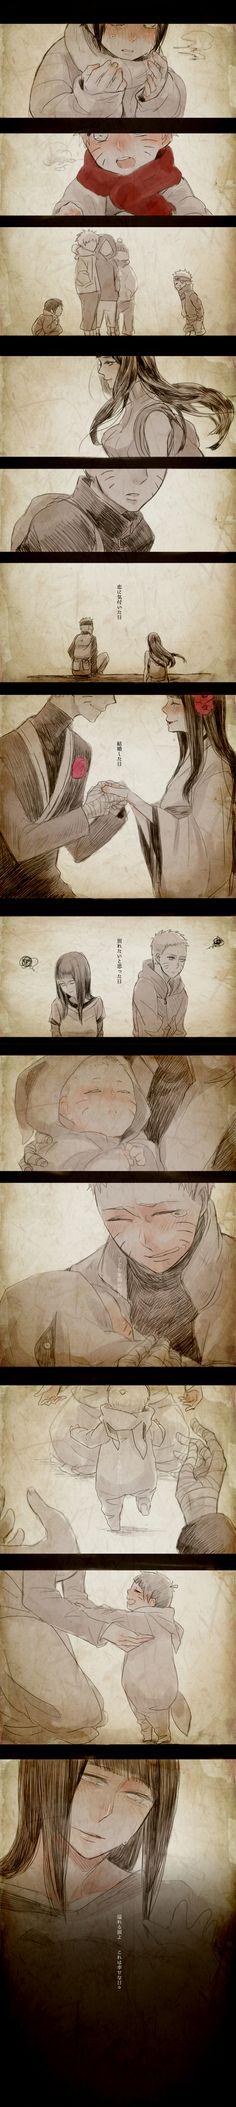 naruto the last movie. Naruto & Hinata